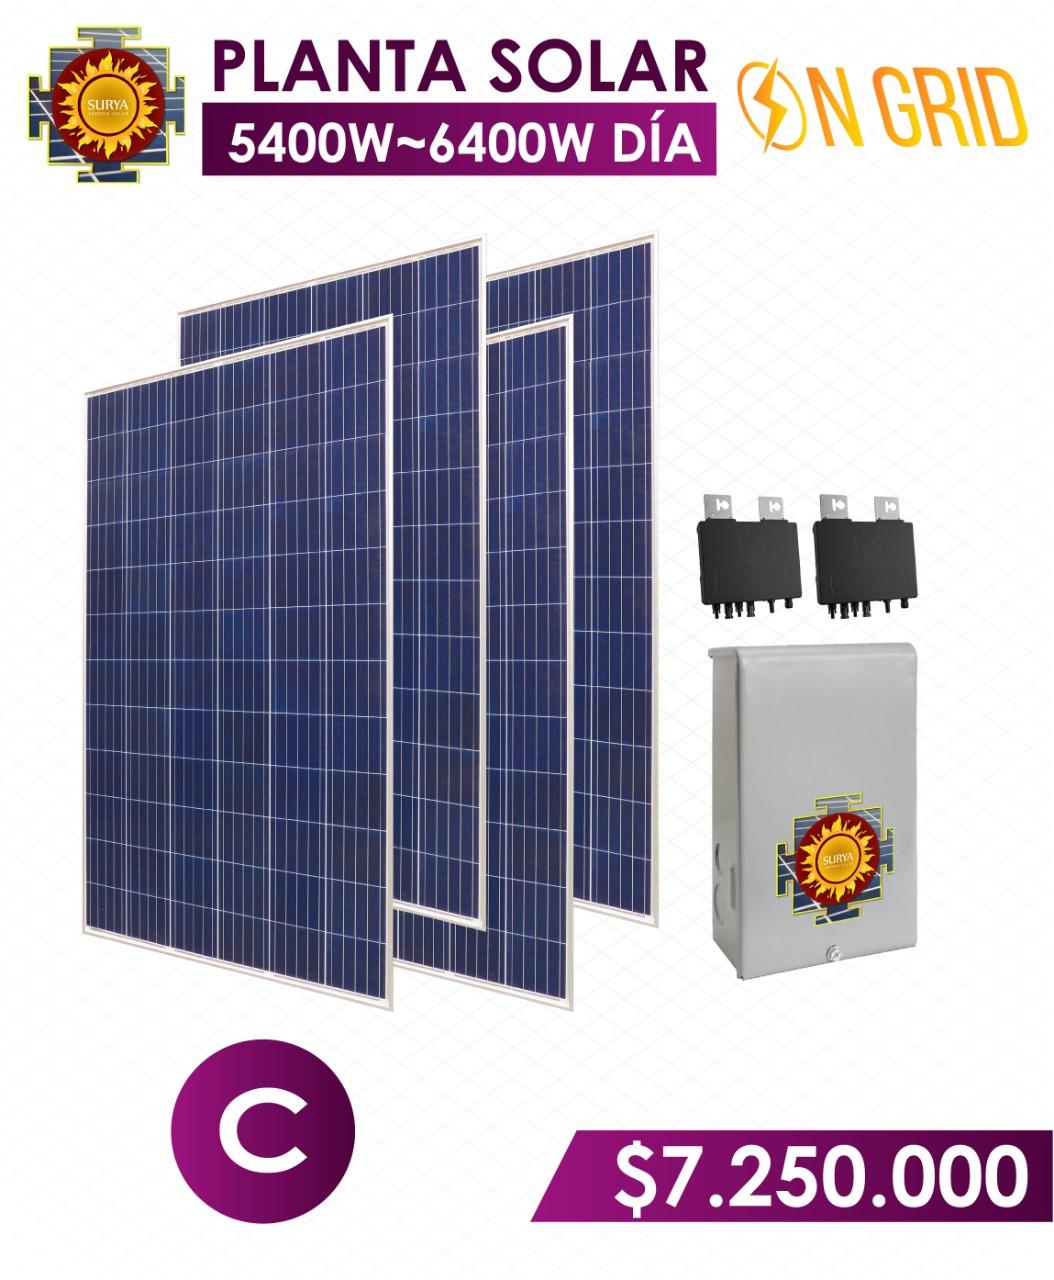 planta solar inyeccion a la red 5400 watts a 6400watts al dia